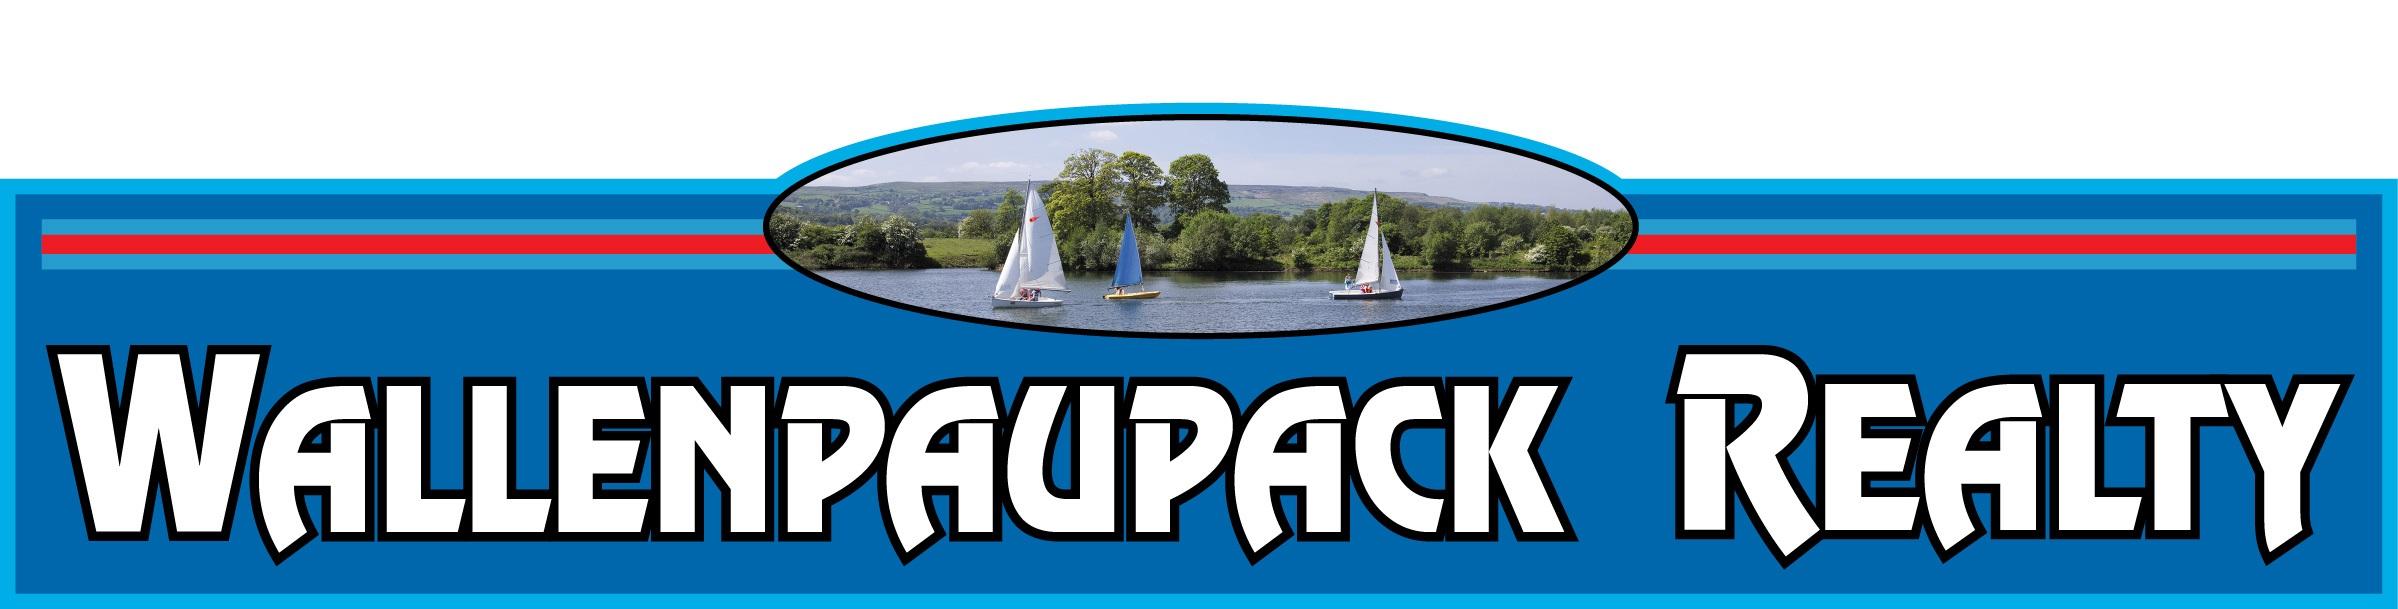 Wallenpaupack Realty Logo